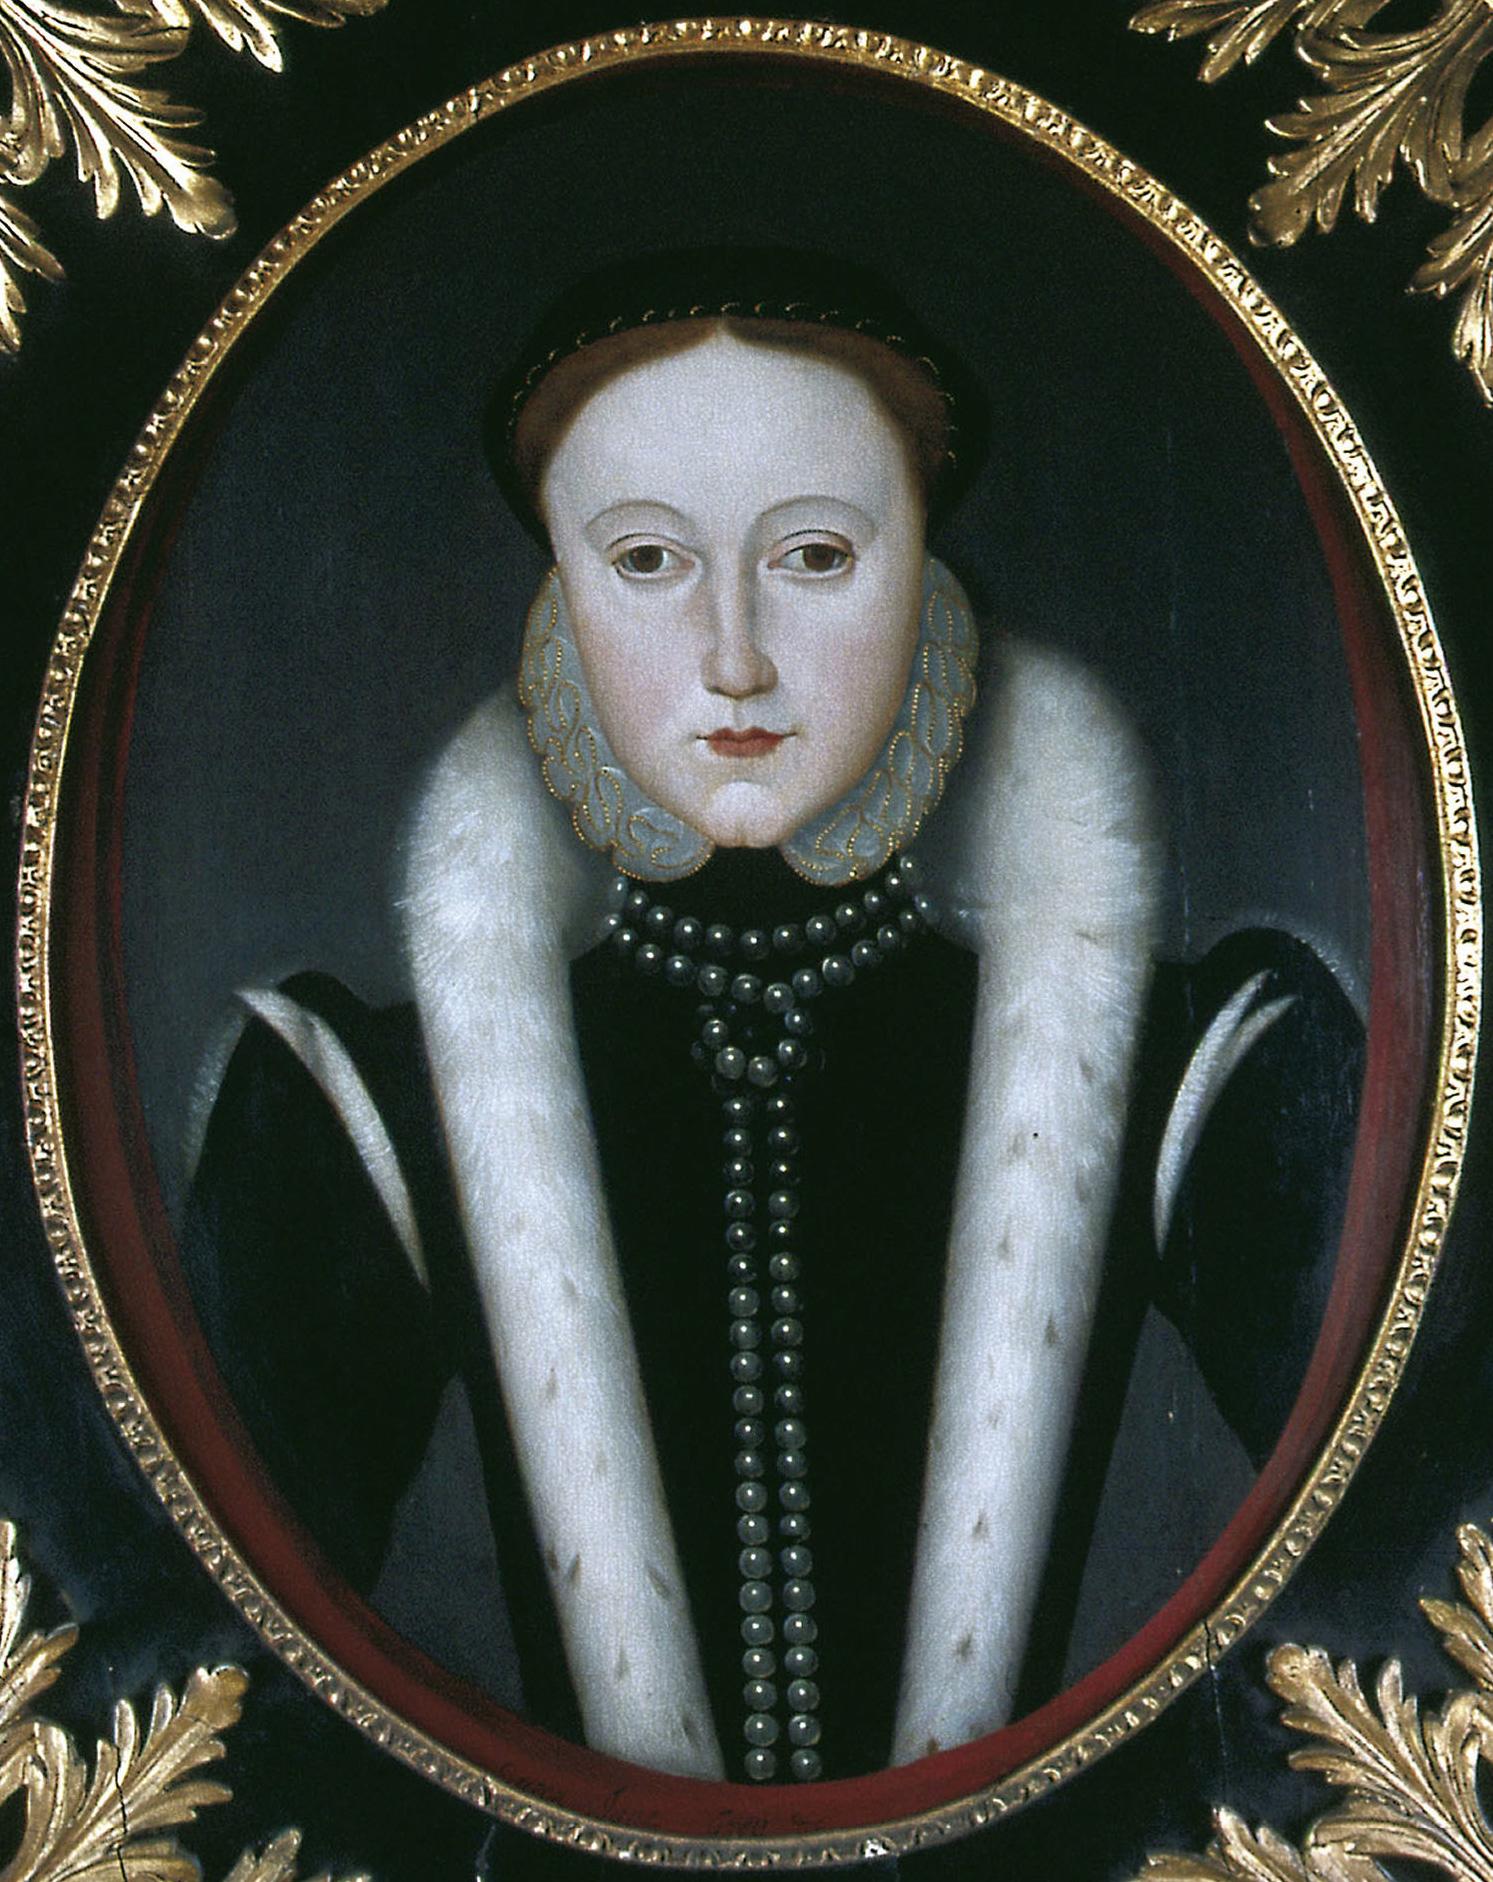 Tudor Queen Jane Grey. Renaissance costume era.